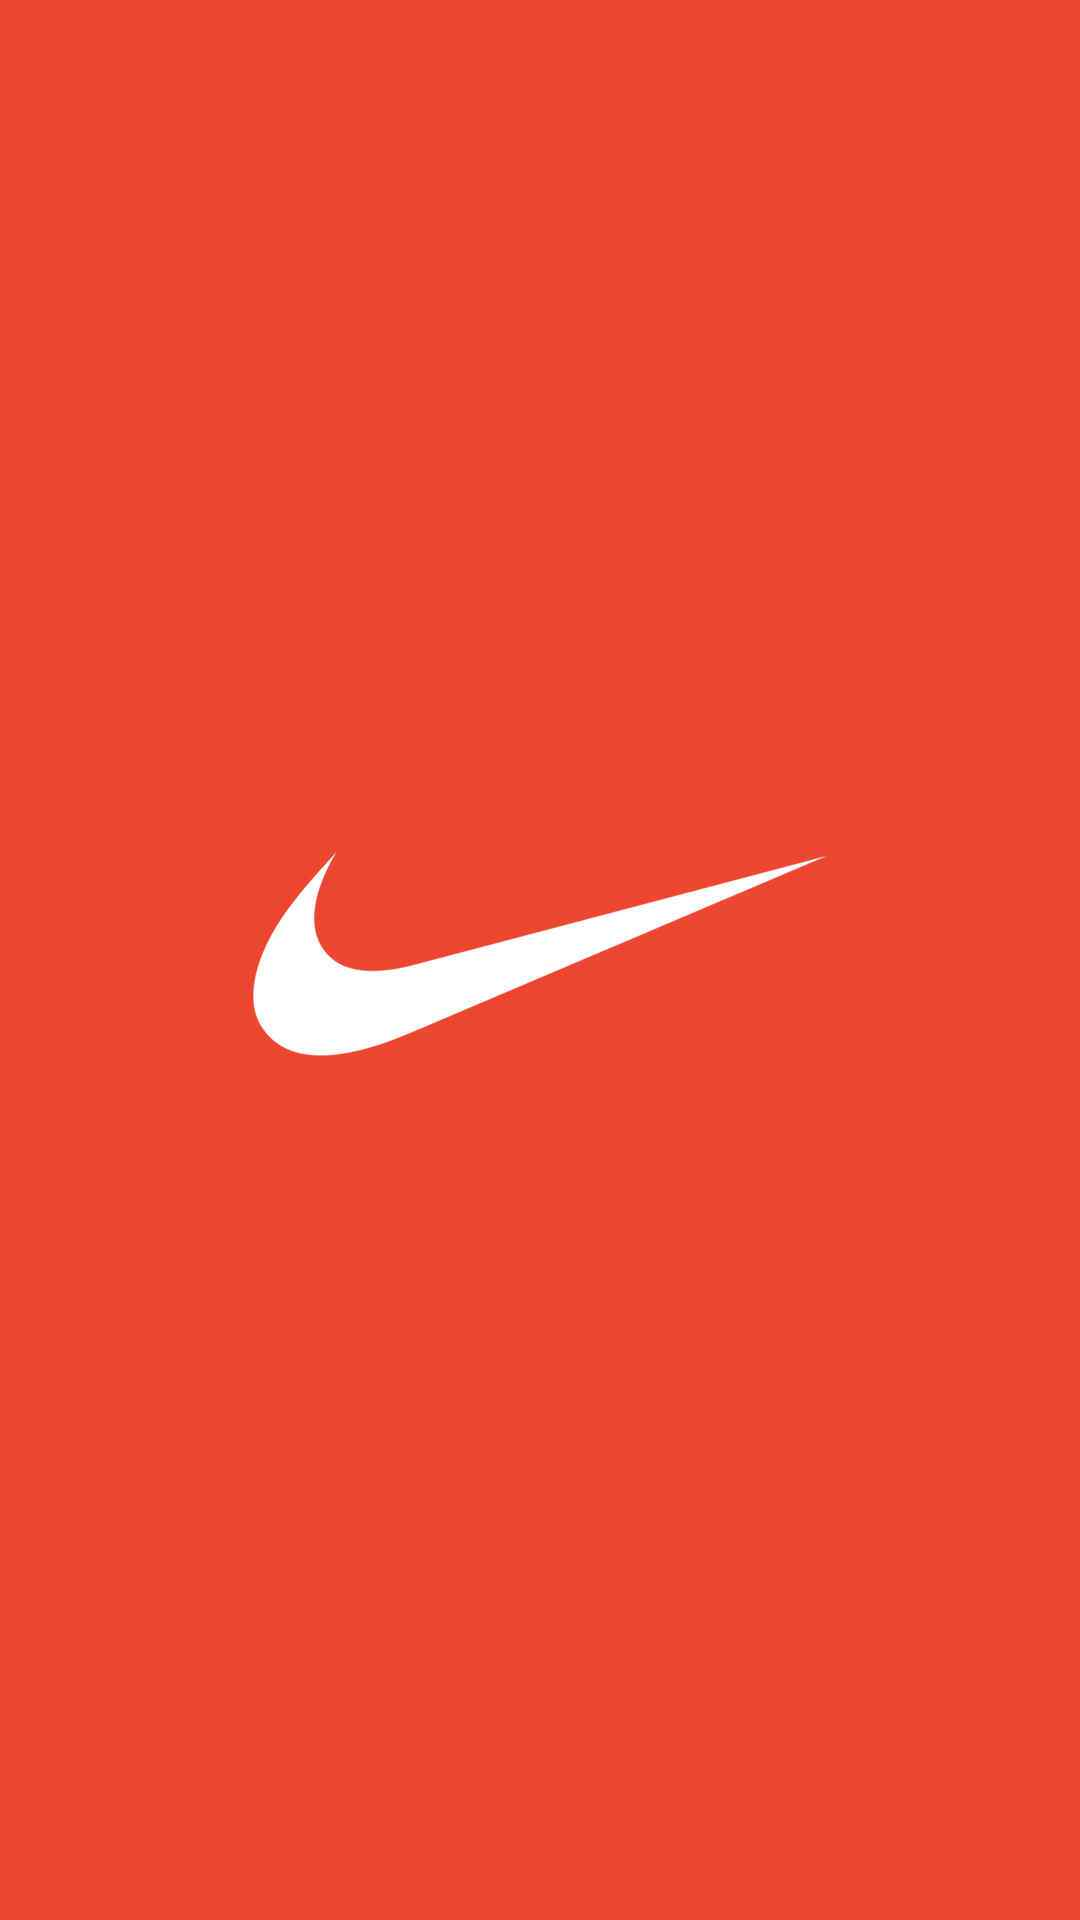 Wallpapers Iphone Nike Wallpaper Cave